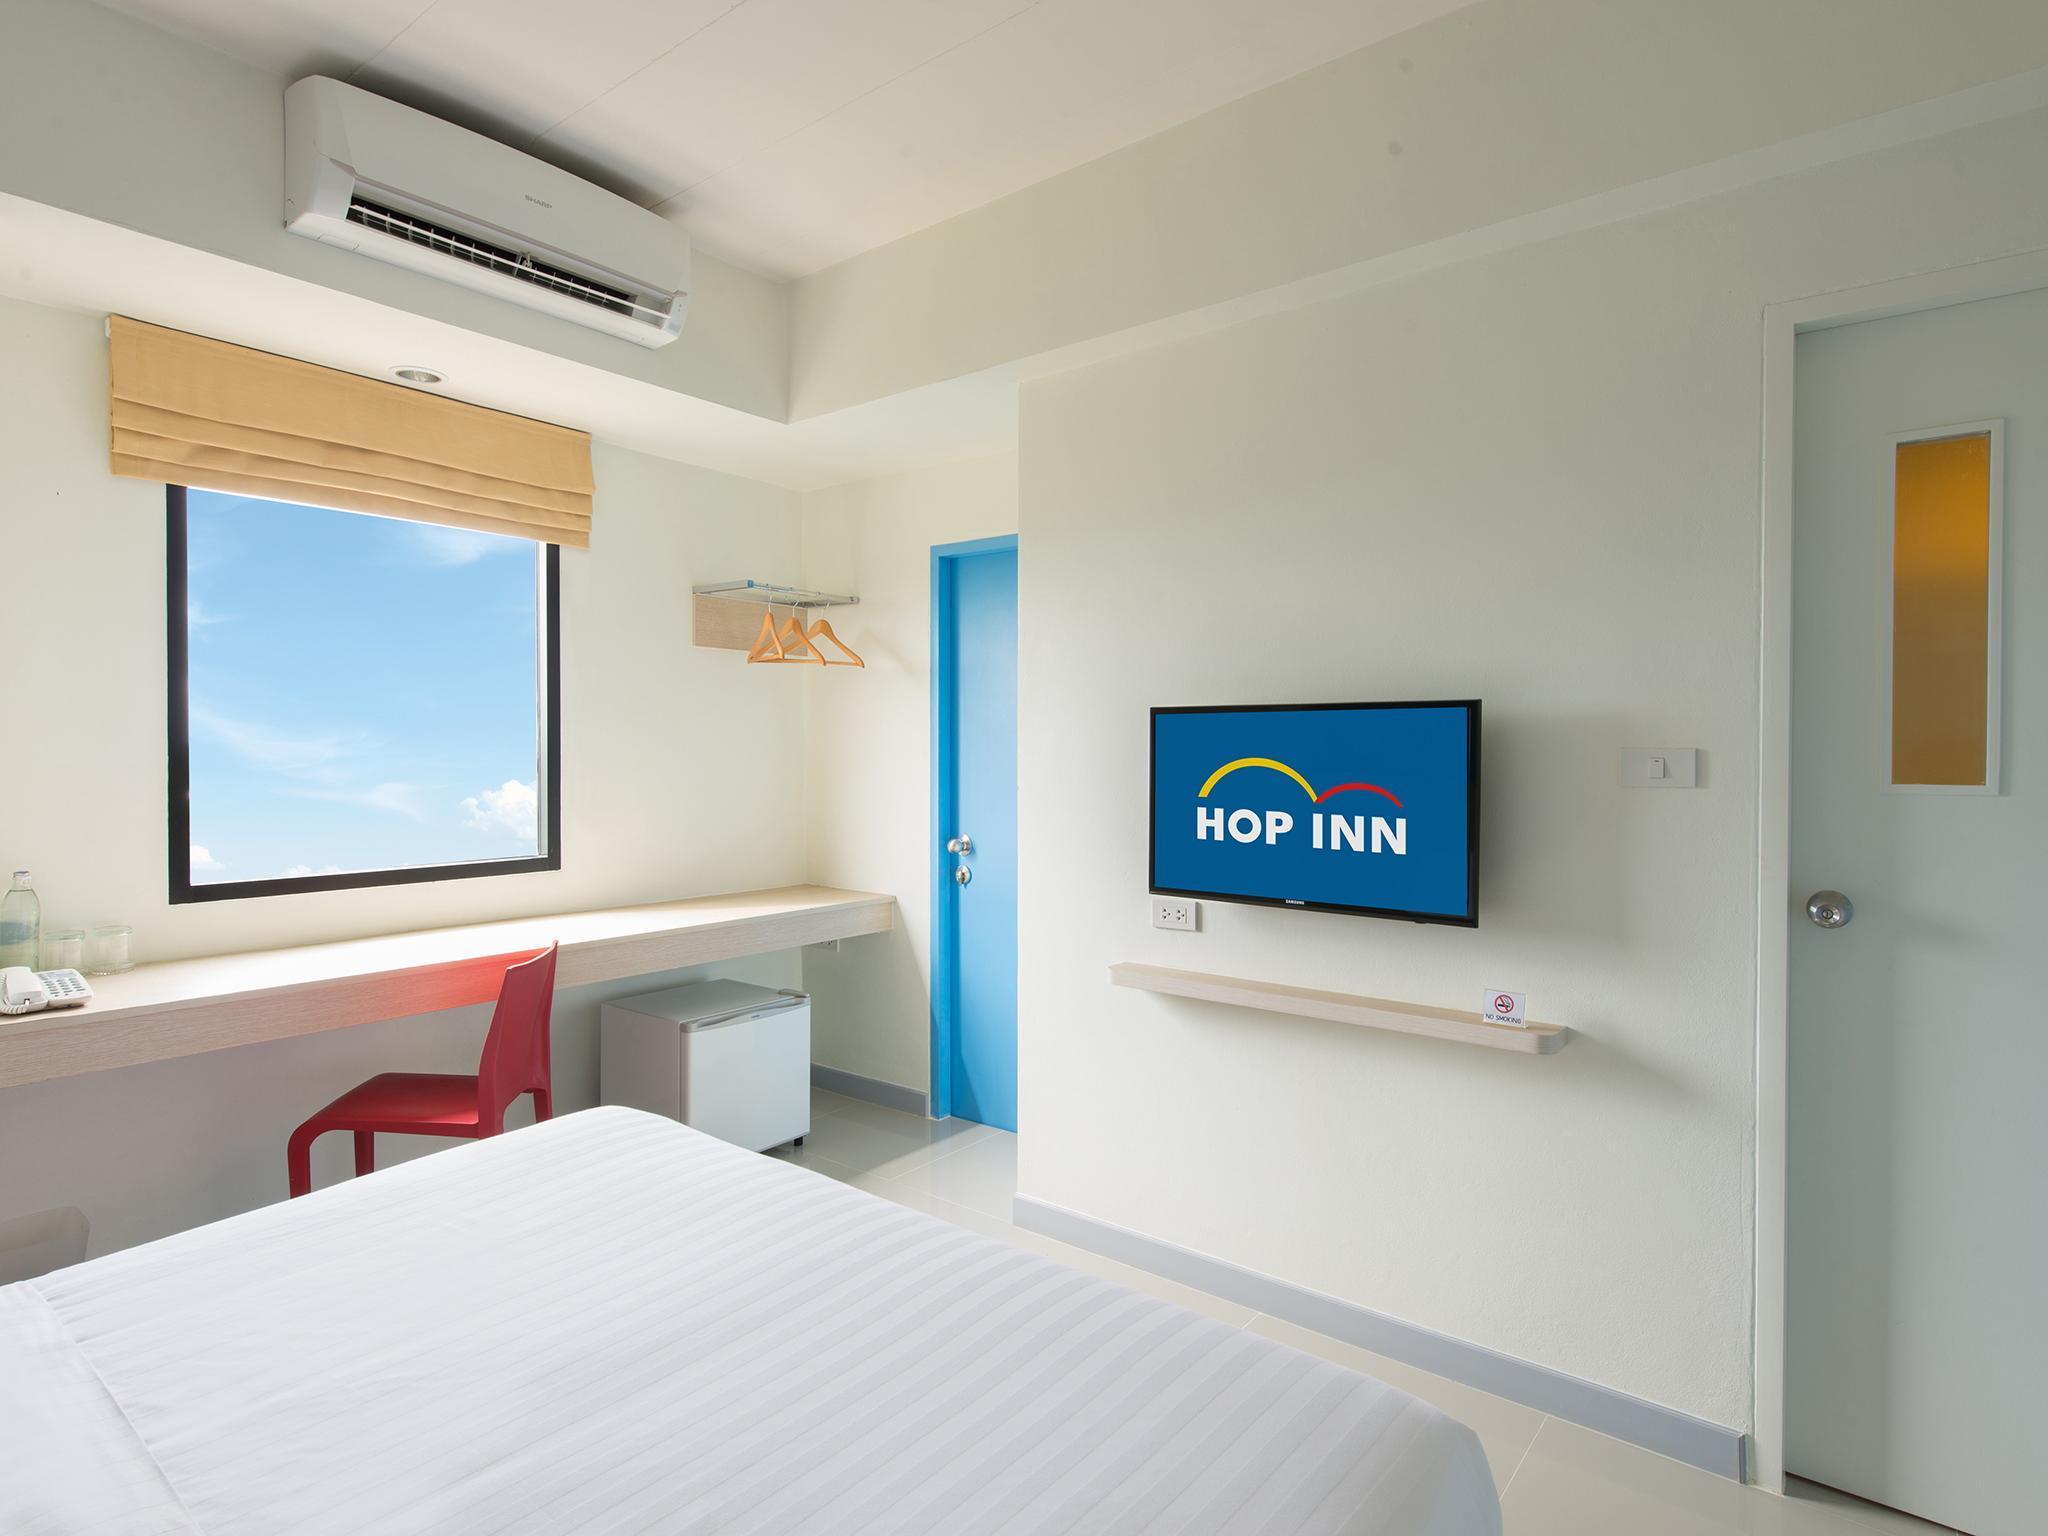 Hop Inn Chonburi,ฮ็อป อินน์ ชลบุรี